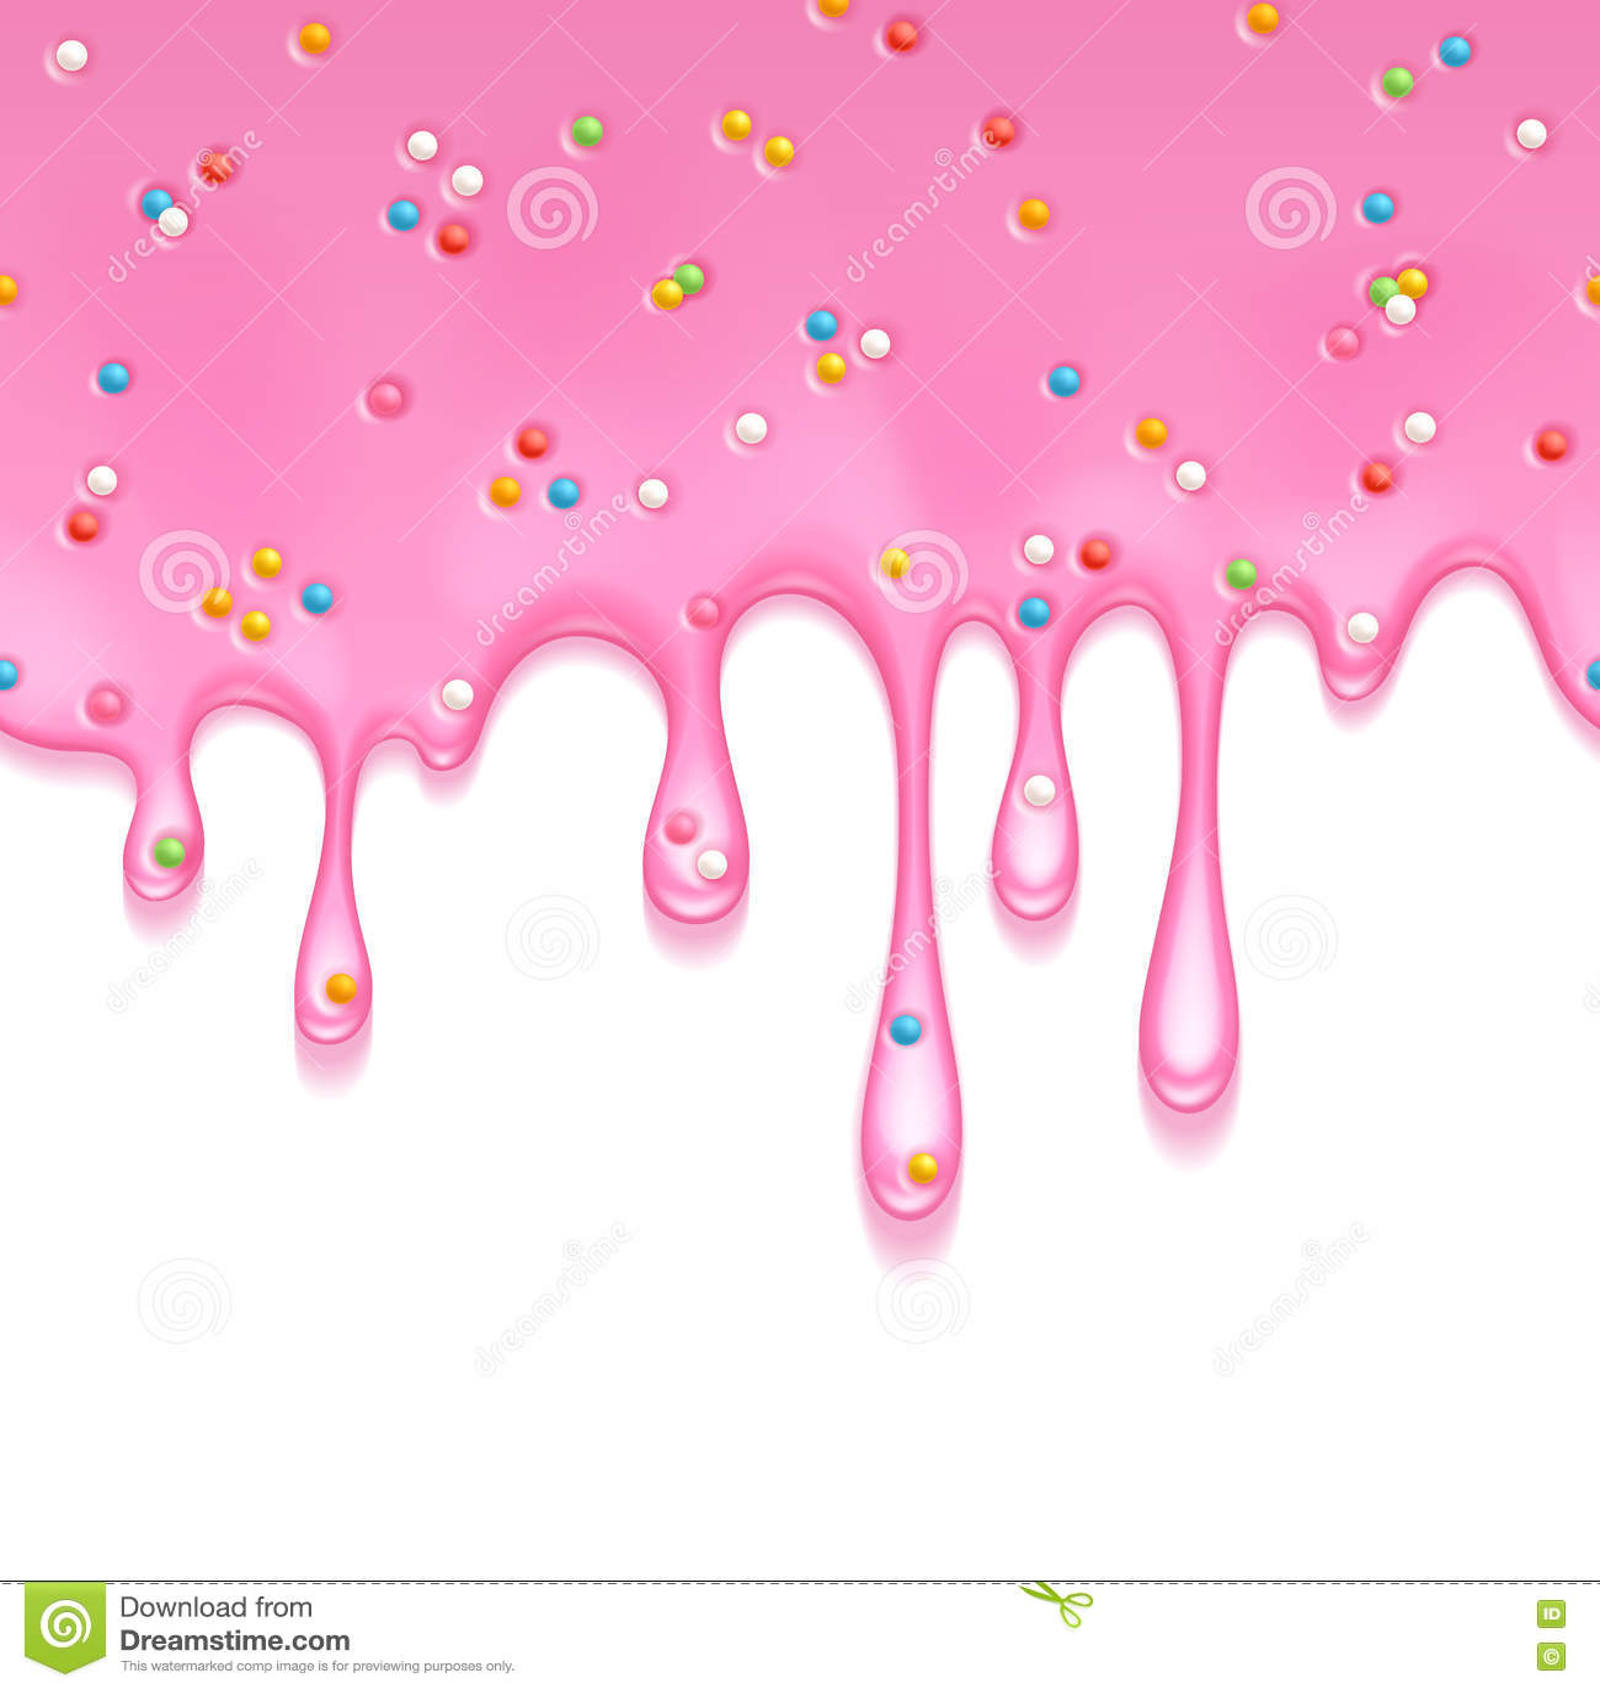 Drops Rainbow 3d Wallpaper Jellylike Cartoons Illustrations Amp Vector Stock Images